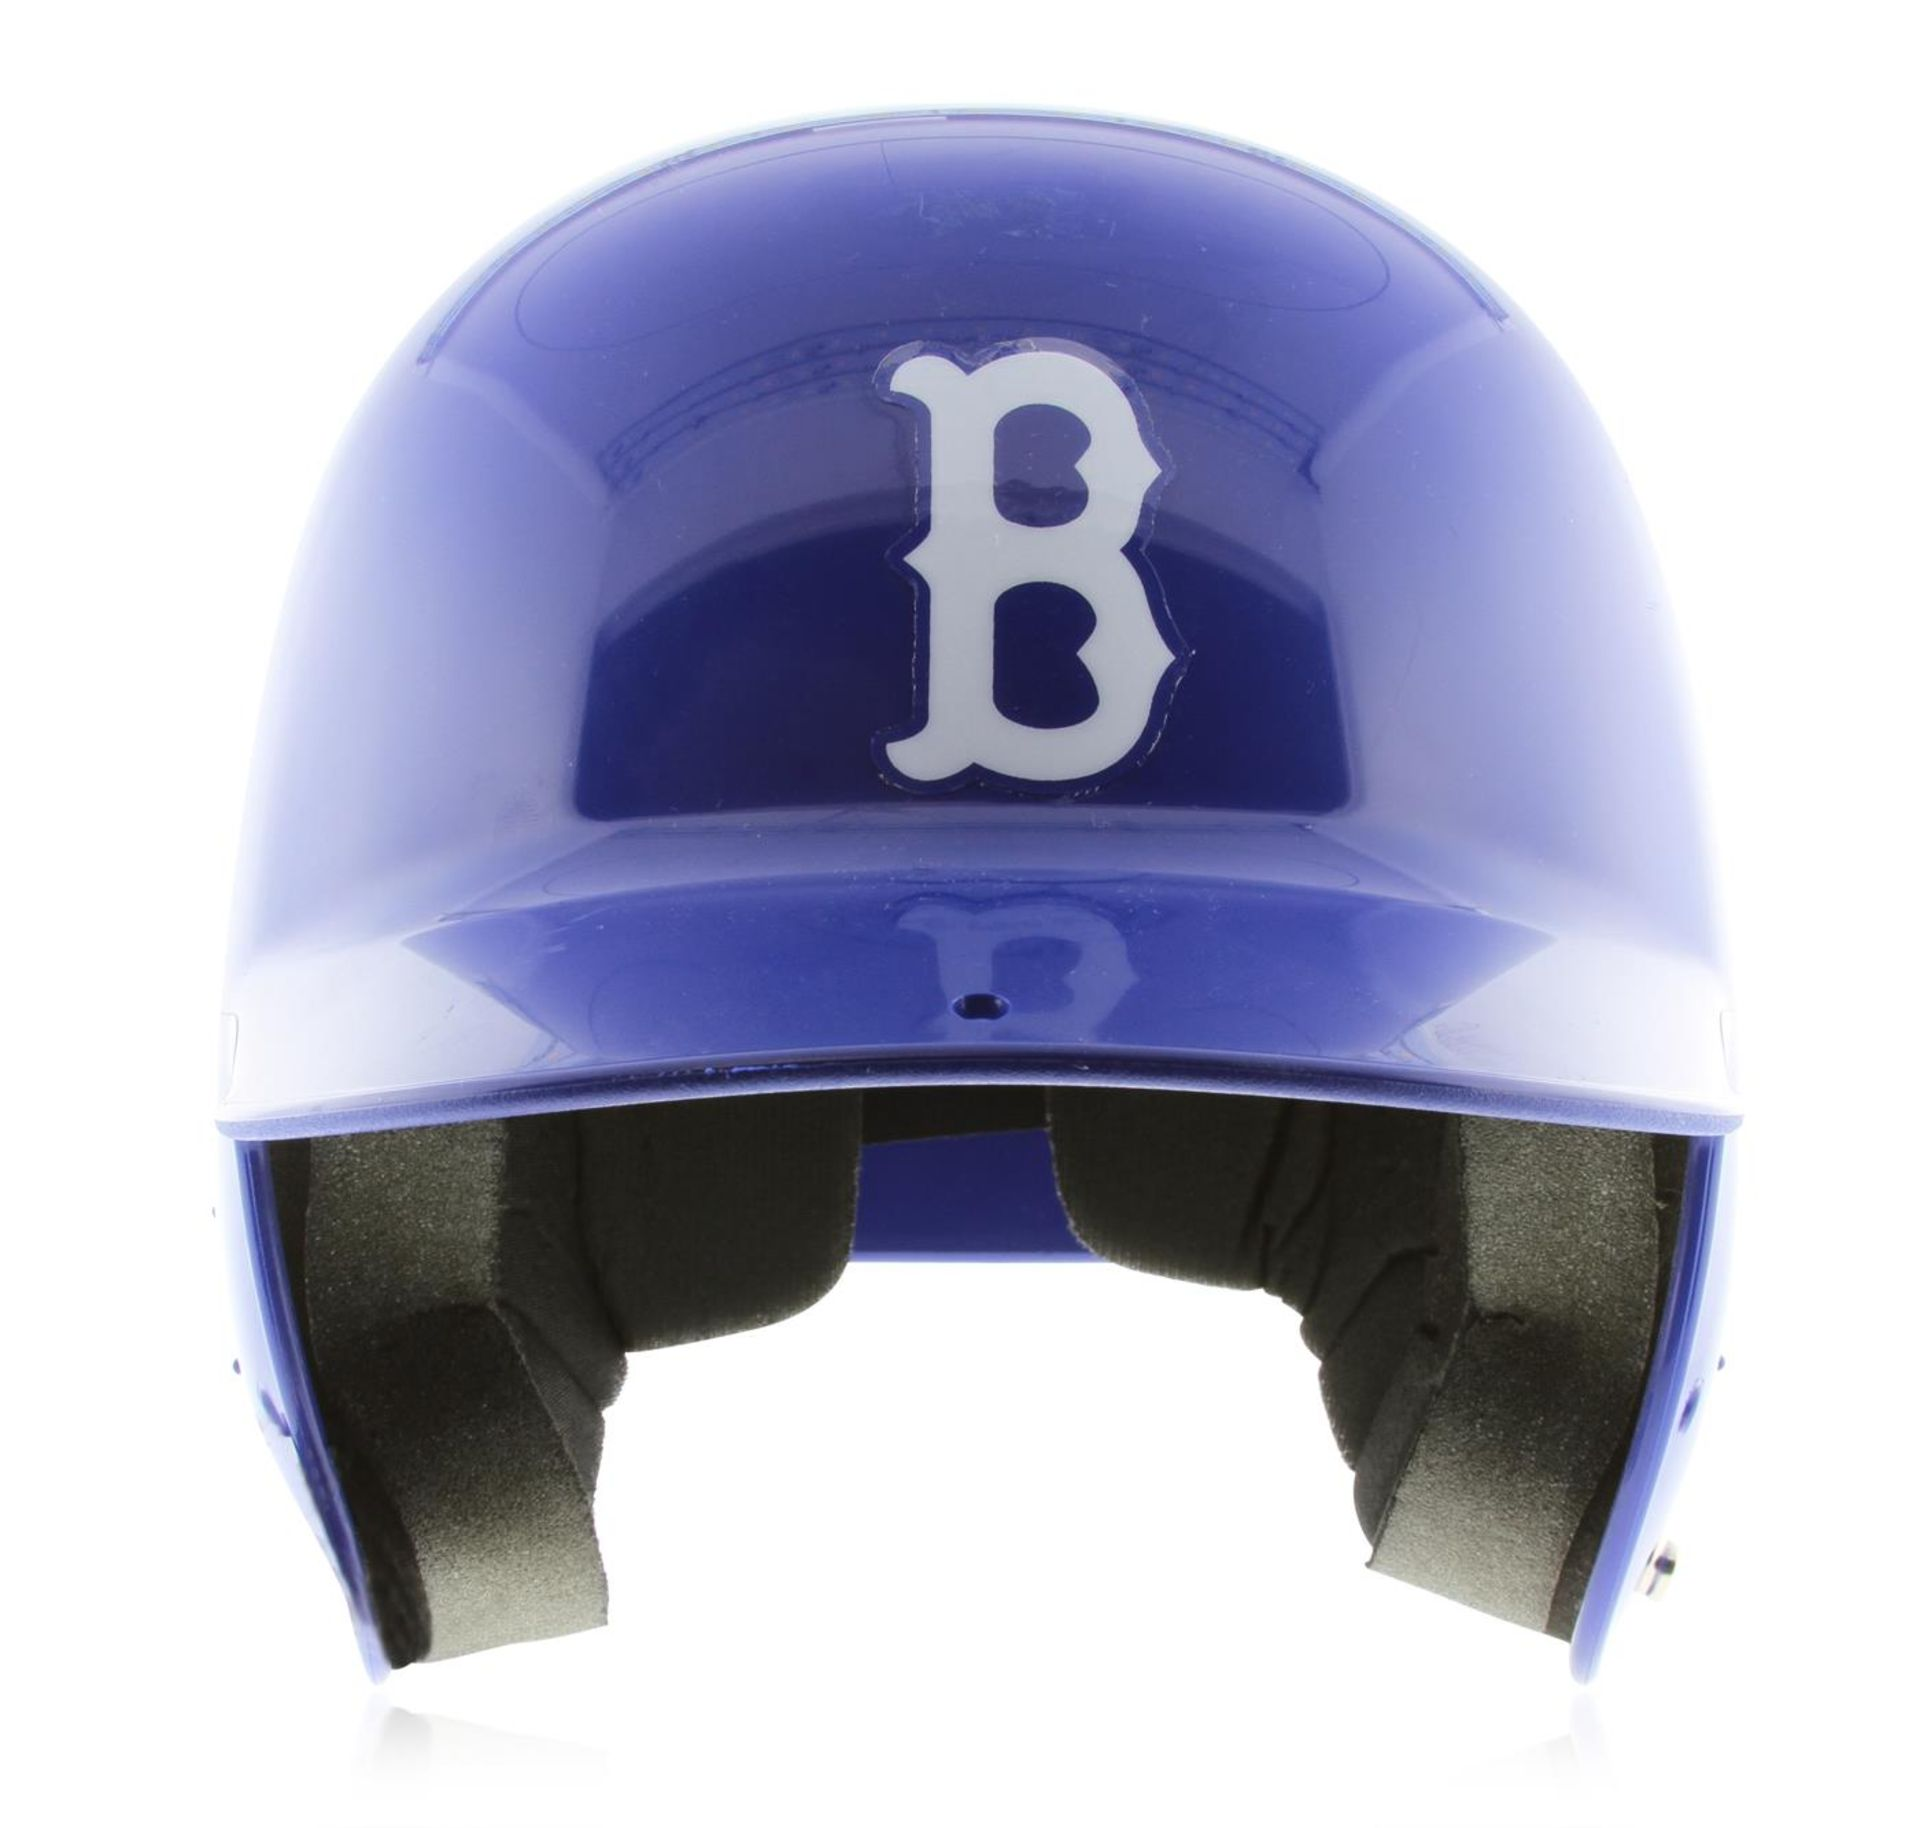 Autographed Duke Snider Brooklyn Helmet PSA Certified - Image 2 of 4